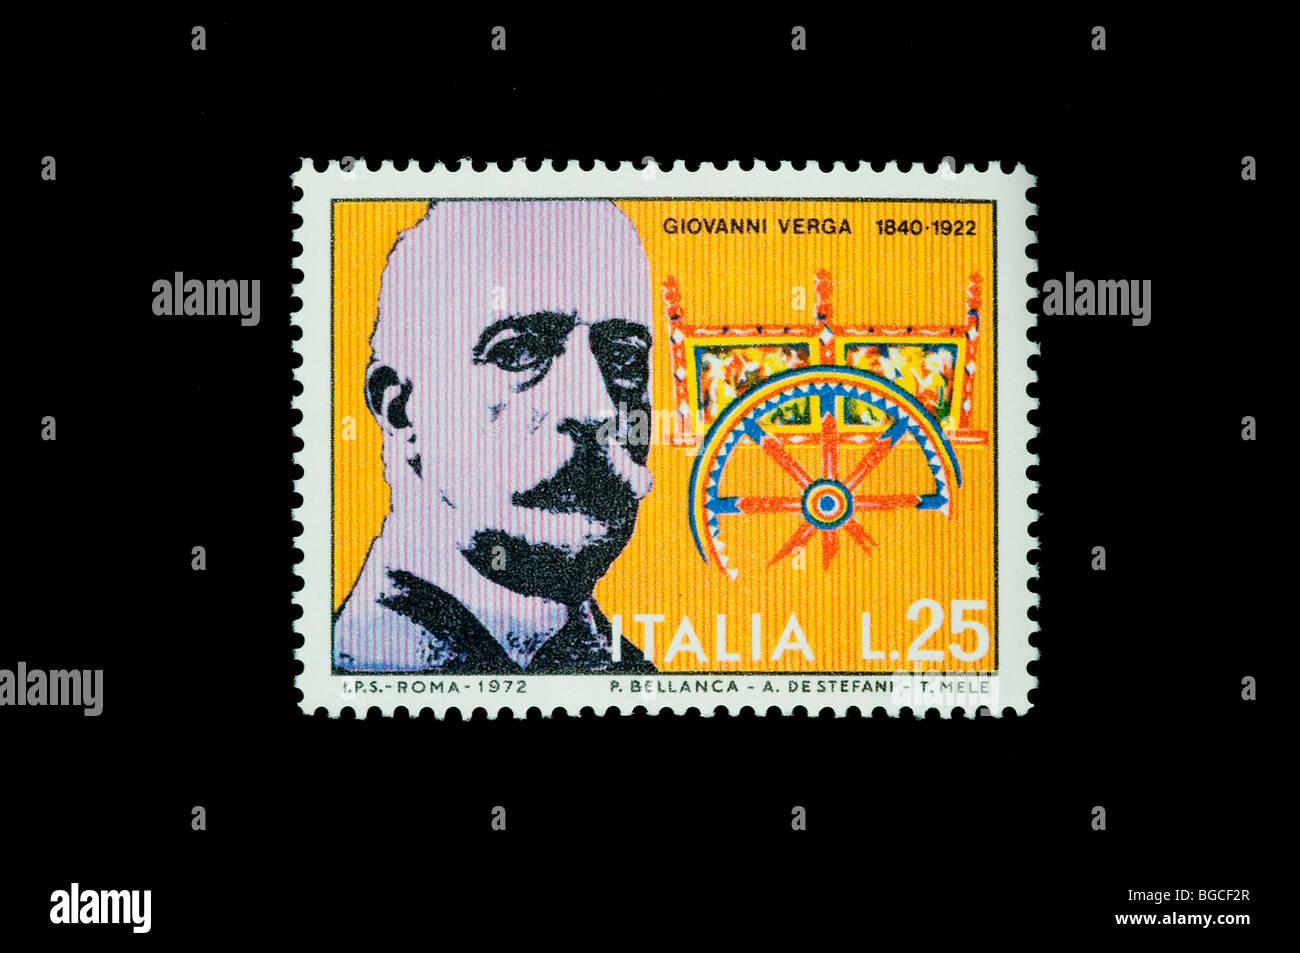 Giovanni Verga  writer on 1972  italian commemorative stamp - Stock Image